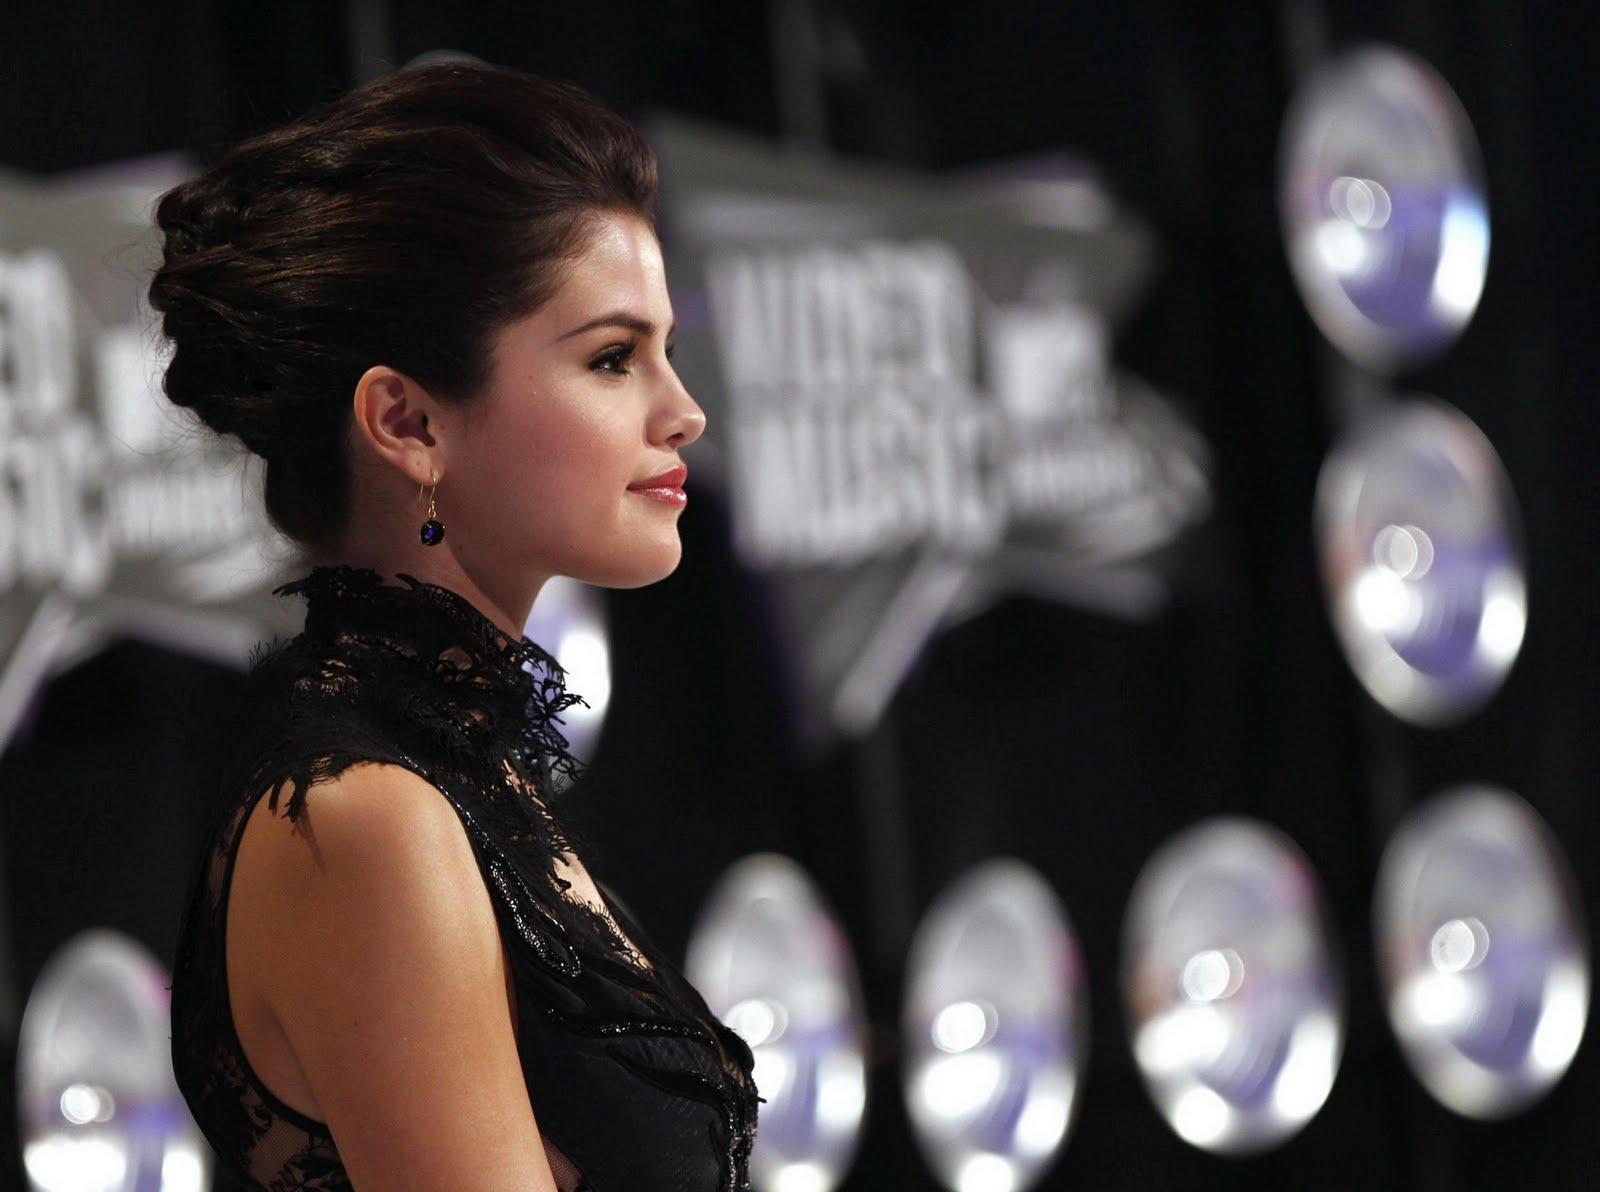 http://4.bp.blogspot.com/-seQUs2kbBOM/TpchnsqgAZI/AAAAAAAAFIc/B7MuSLuMgFY/s1600/Selena-Gomez-MTV%2BVideo%2BMusic%2BAwards%2B2011%2B%252811%2529.jpg